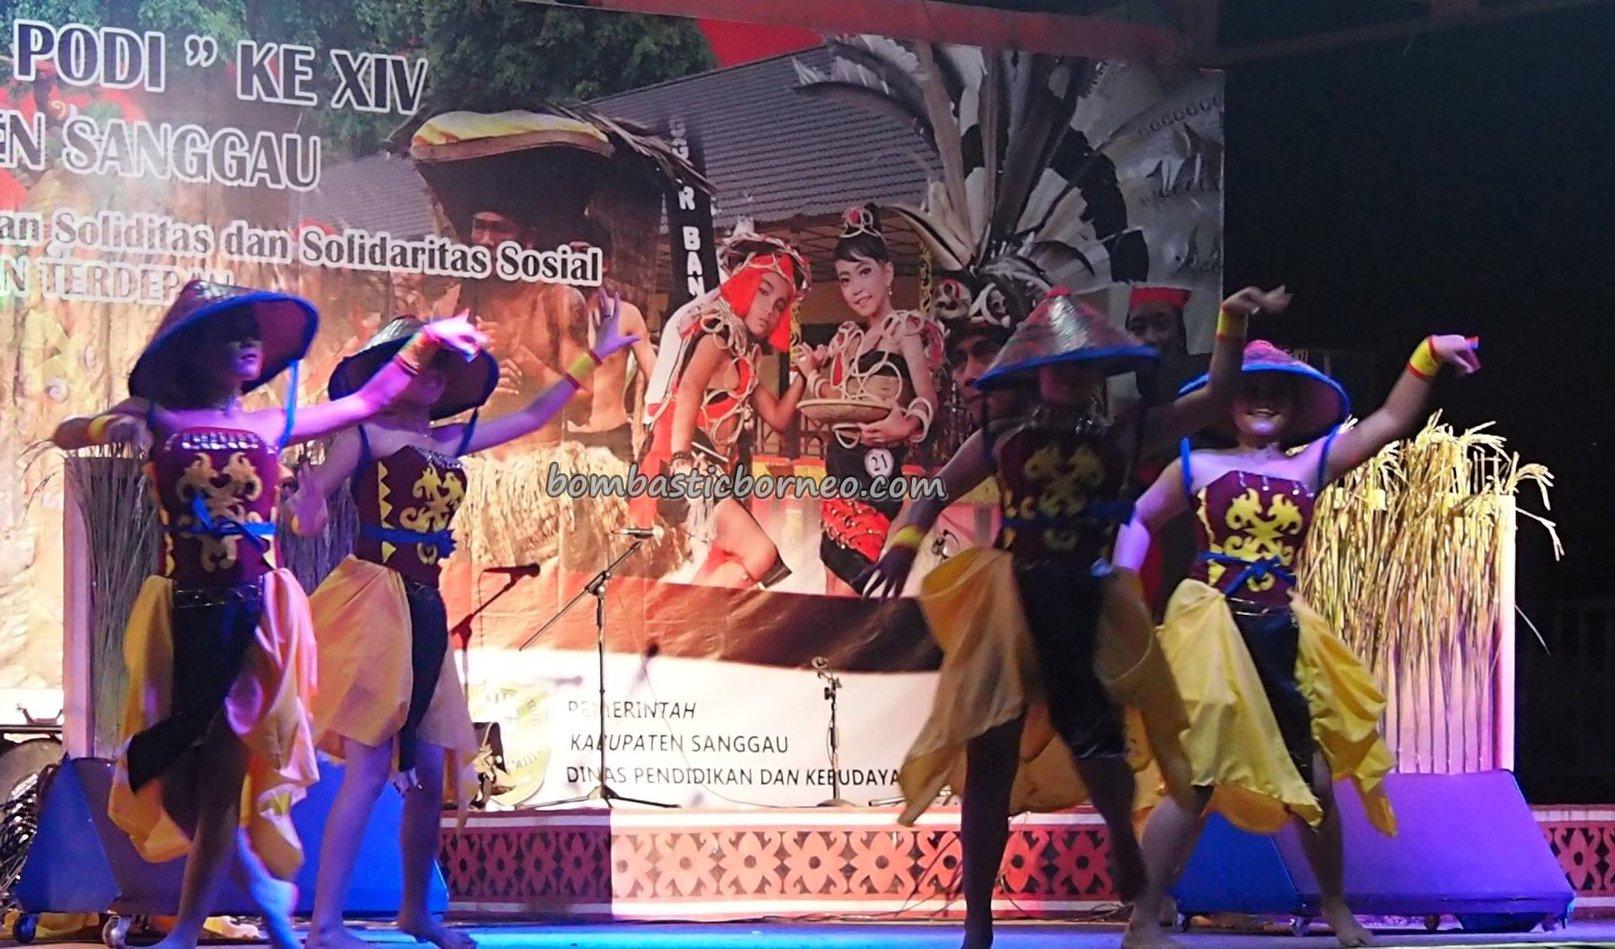 Gawai Dayak Sanggau, paddy harvest festival, indigenous, traditional, culture, event, Indonesia, West Kalimantan, etnis, native, tribal, wisata budaya, Tourism, travel guide, trans borneo,